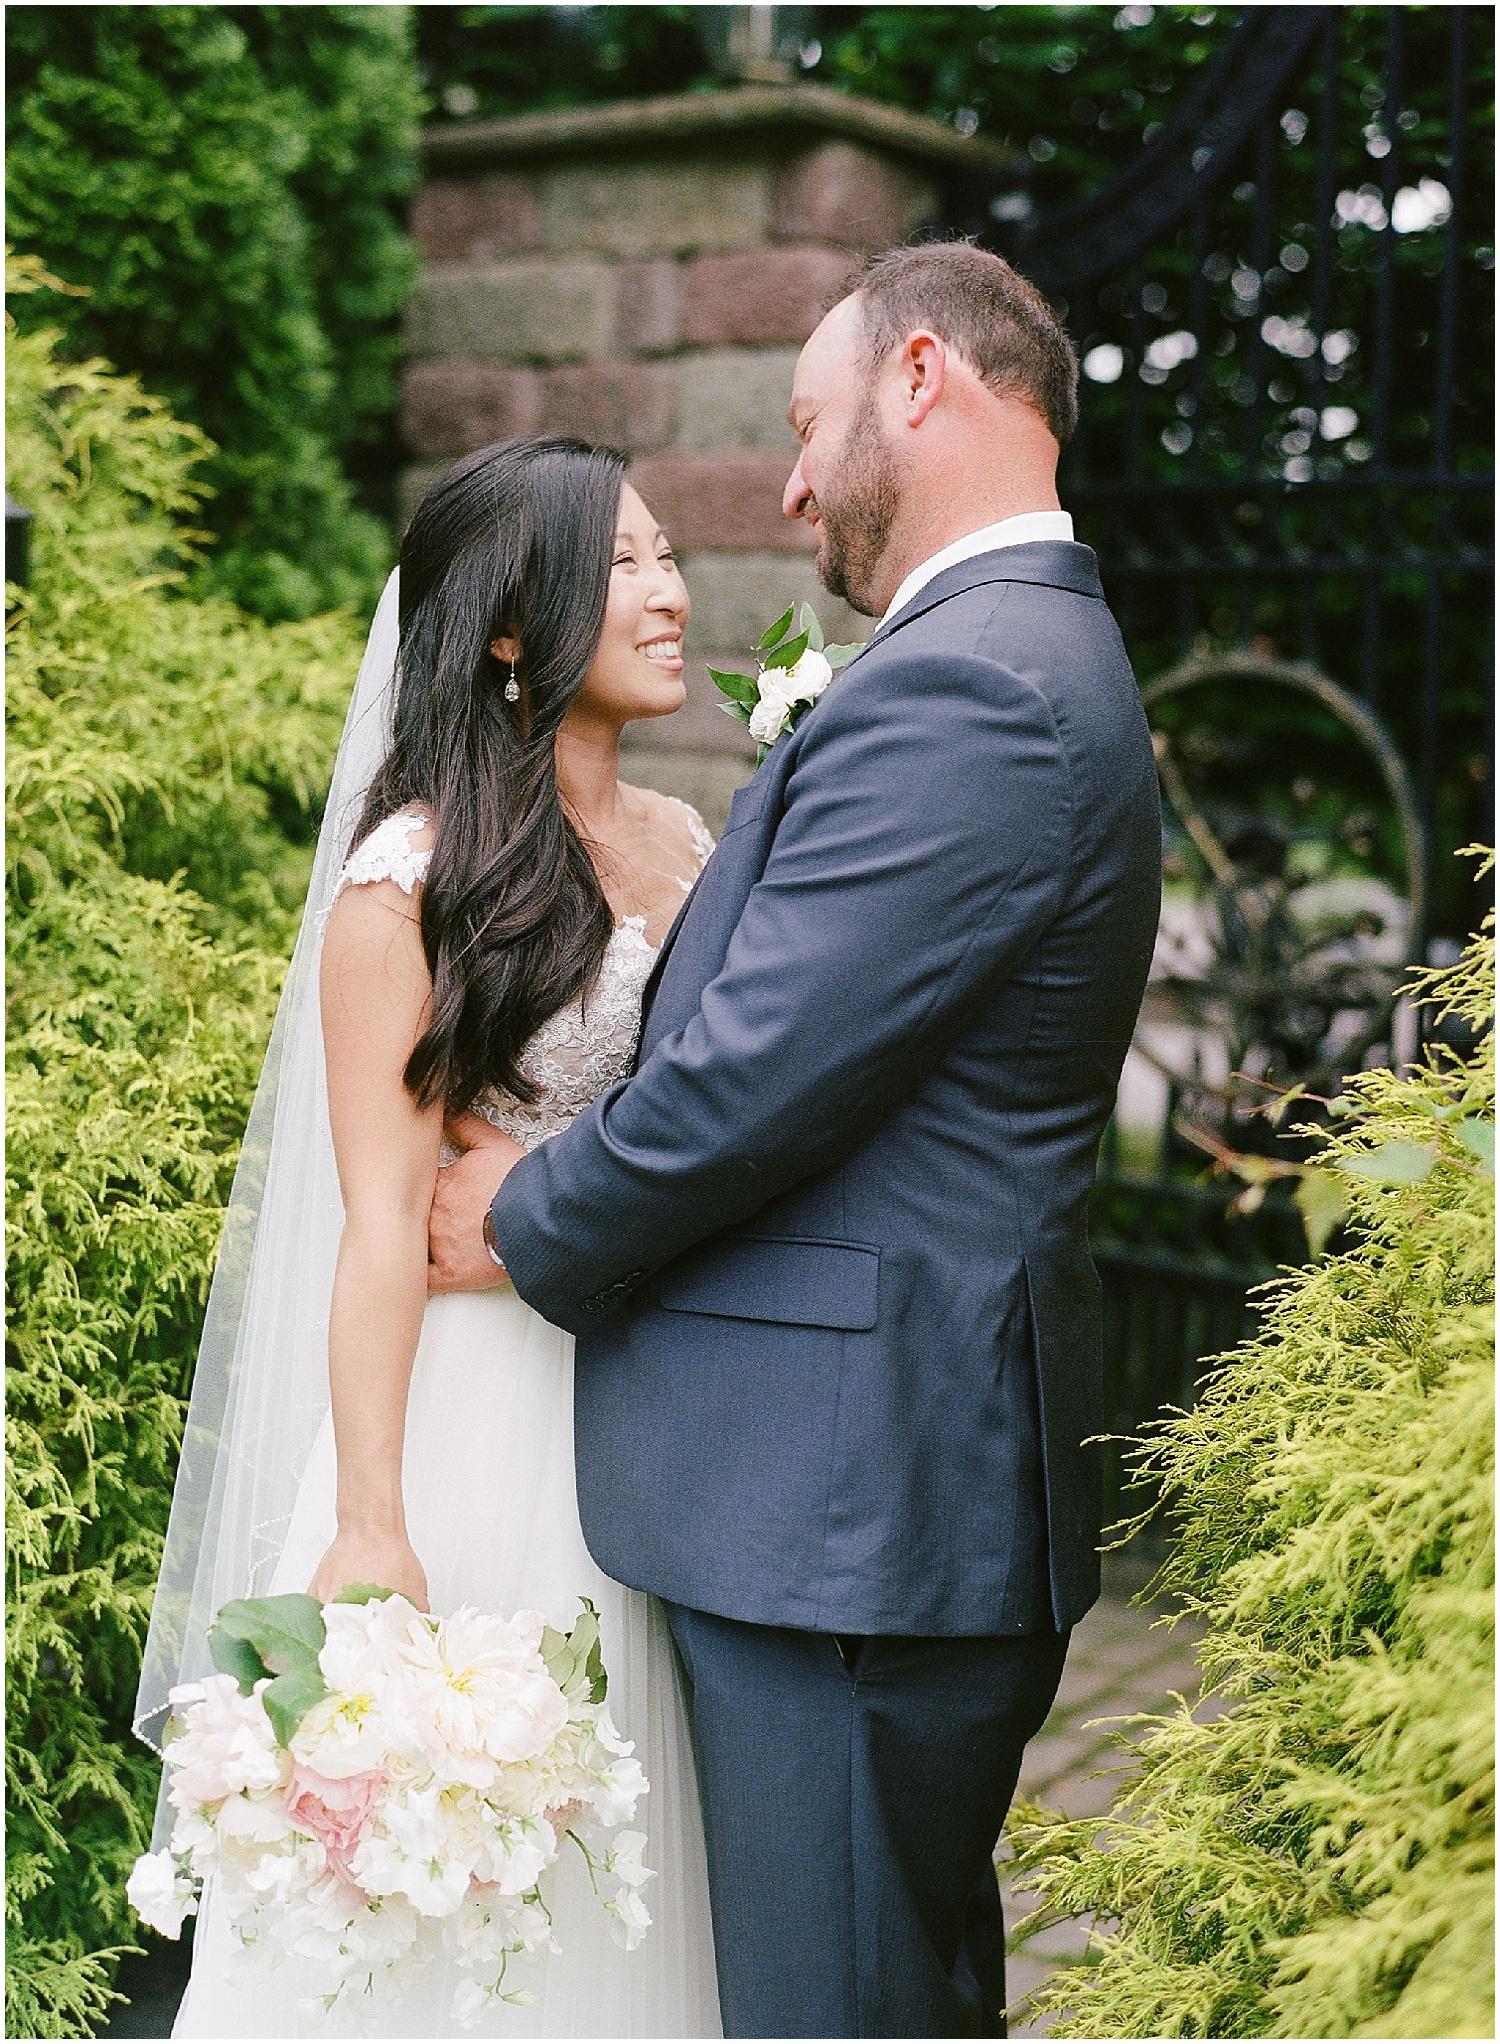 new jersey outdoor wedding, Monmouth University Wilson Hall, natural light photographer, film photographer, beautiful bride and groom portrait